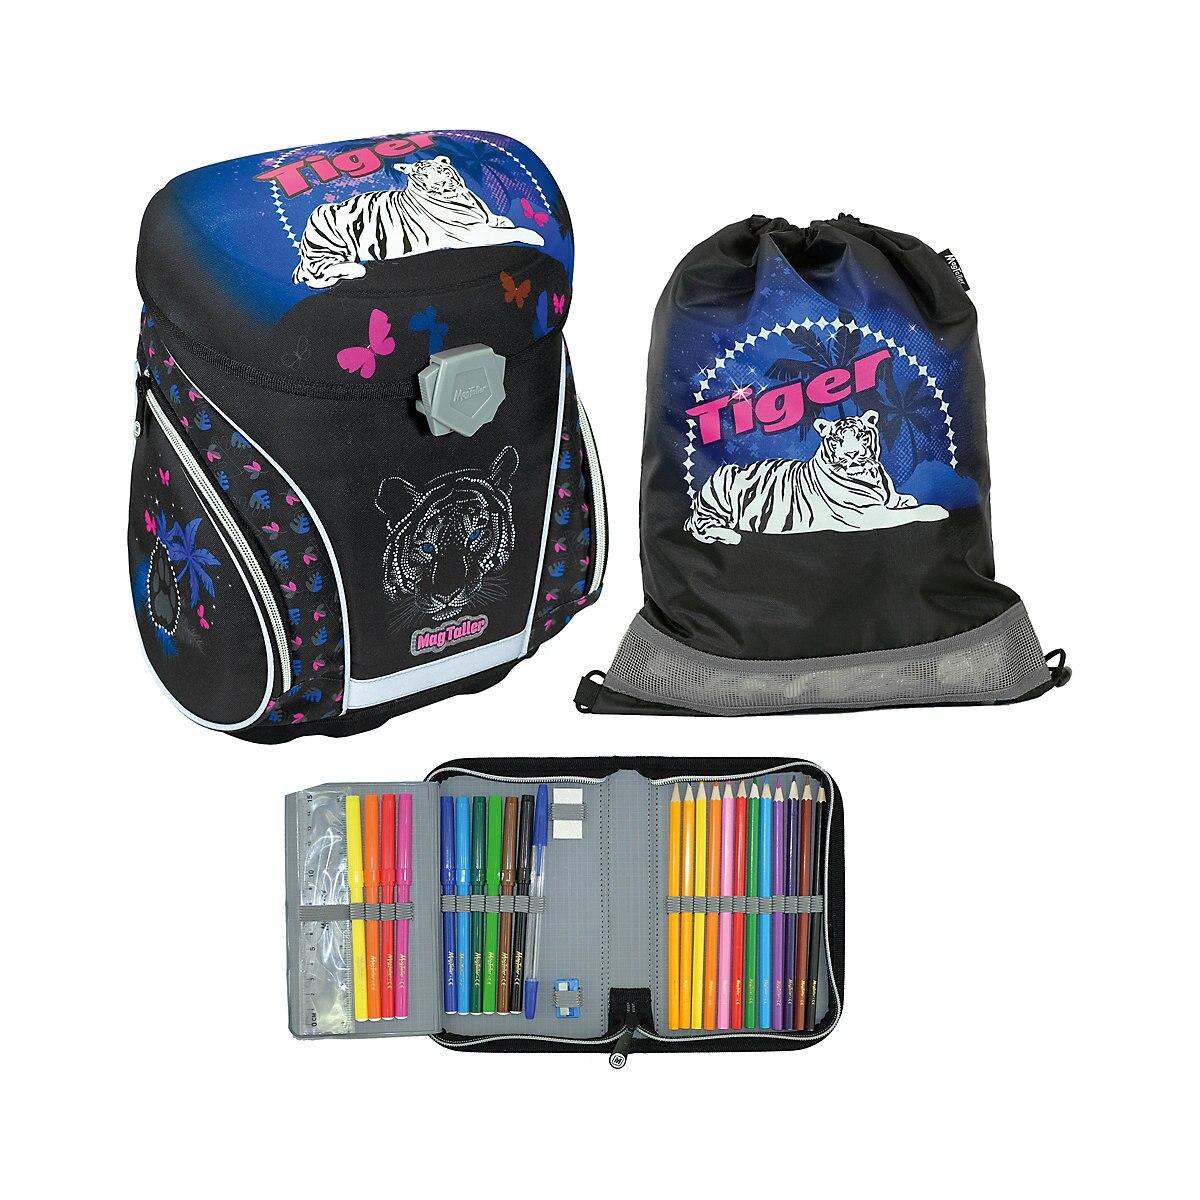 School Bags MAGTALLER 8315982 schoolbag backpack orthopedic bag for boy and girl animals flowers shunvbasha famous brand backpack women backpacks solid fashion girls school bags for girls black pu leather women backpack k44